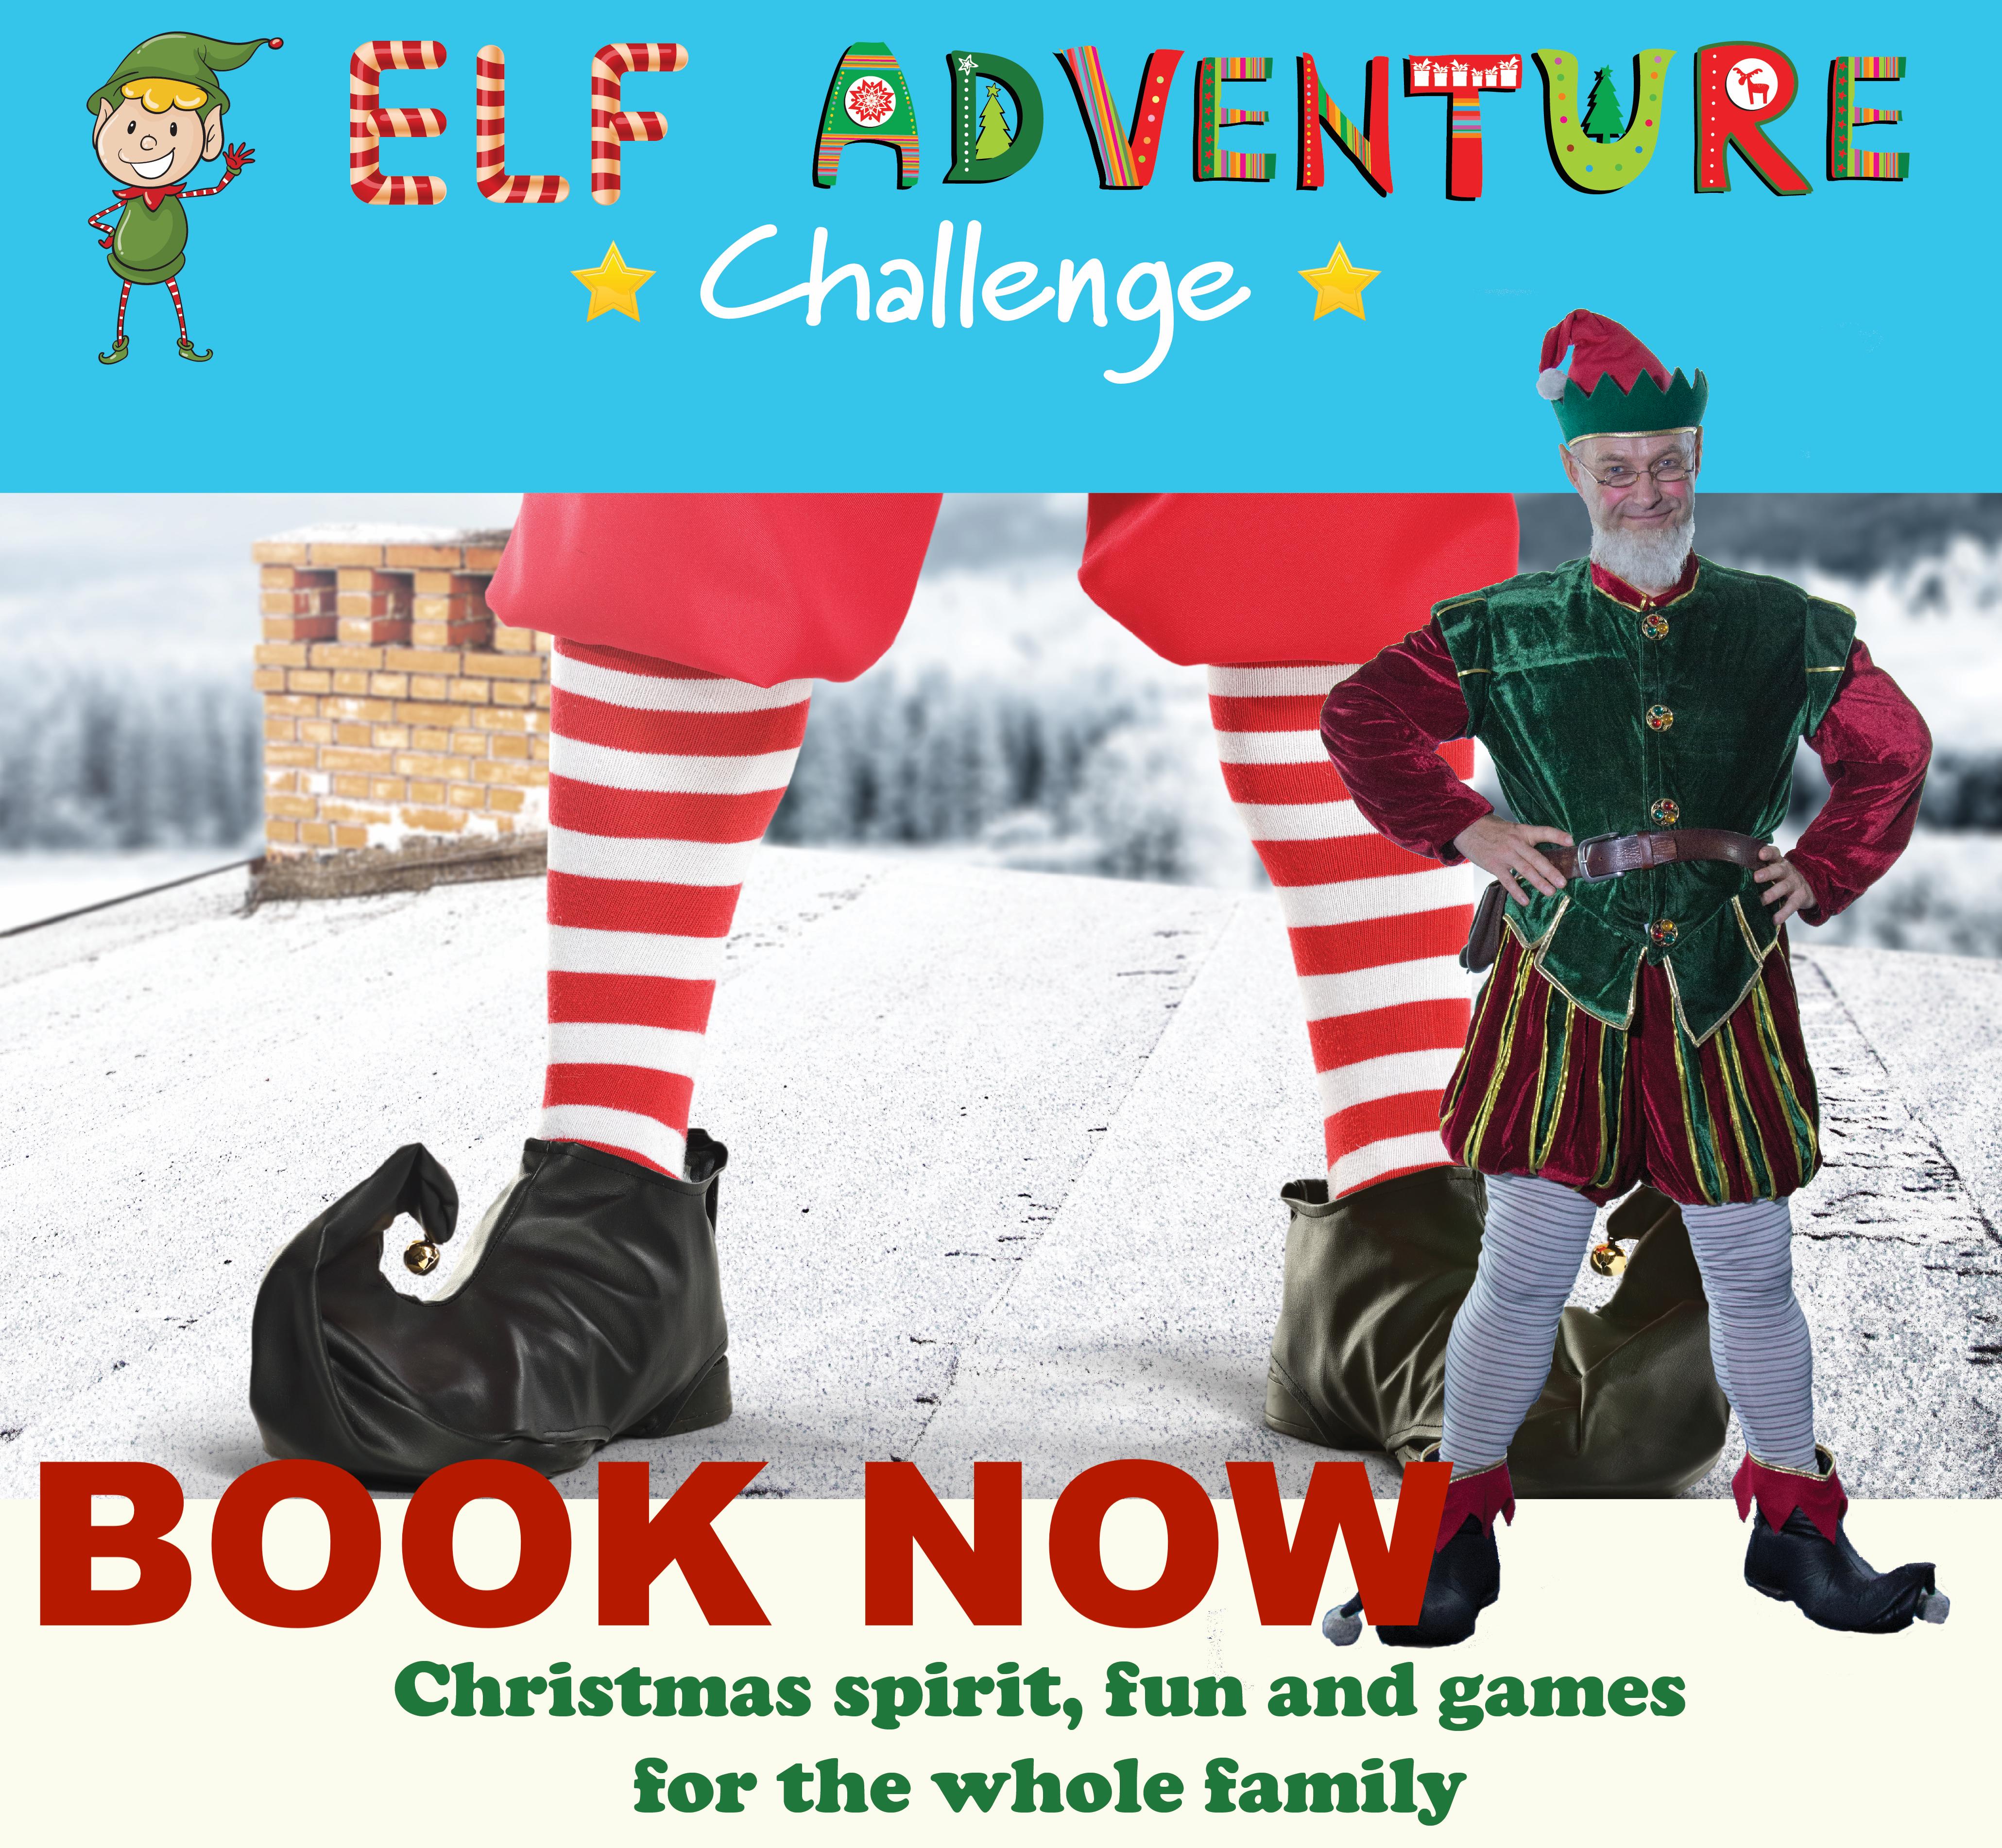 elf adventure challenge christmas event book now